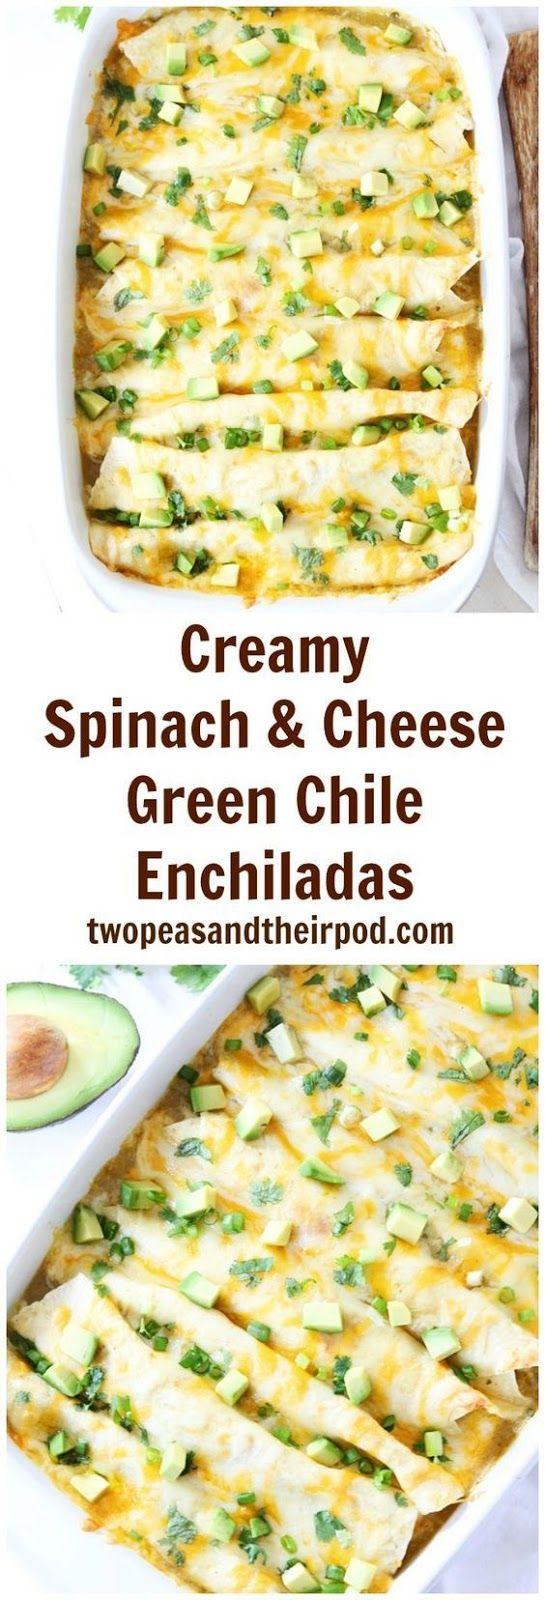 Creamy Spinach And Cheese Green Chile Enchiladas Resep Makanan Resep Vegetarian Makanan